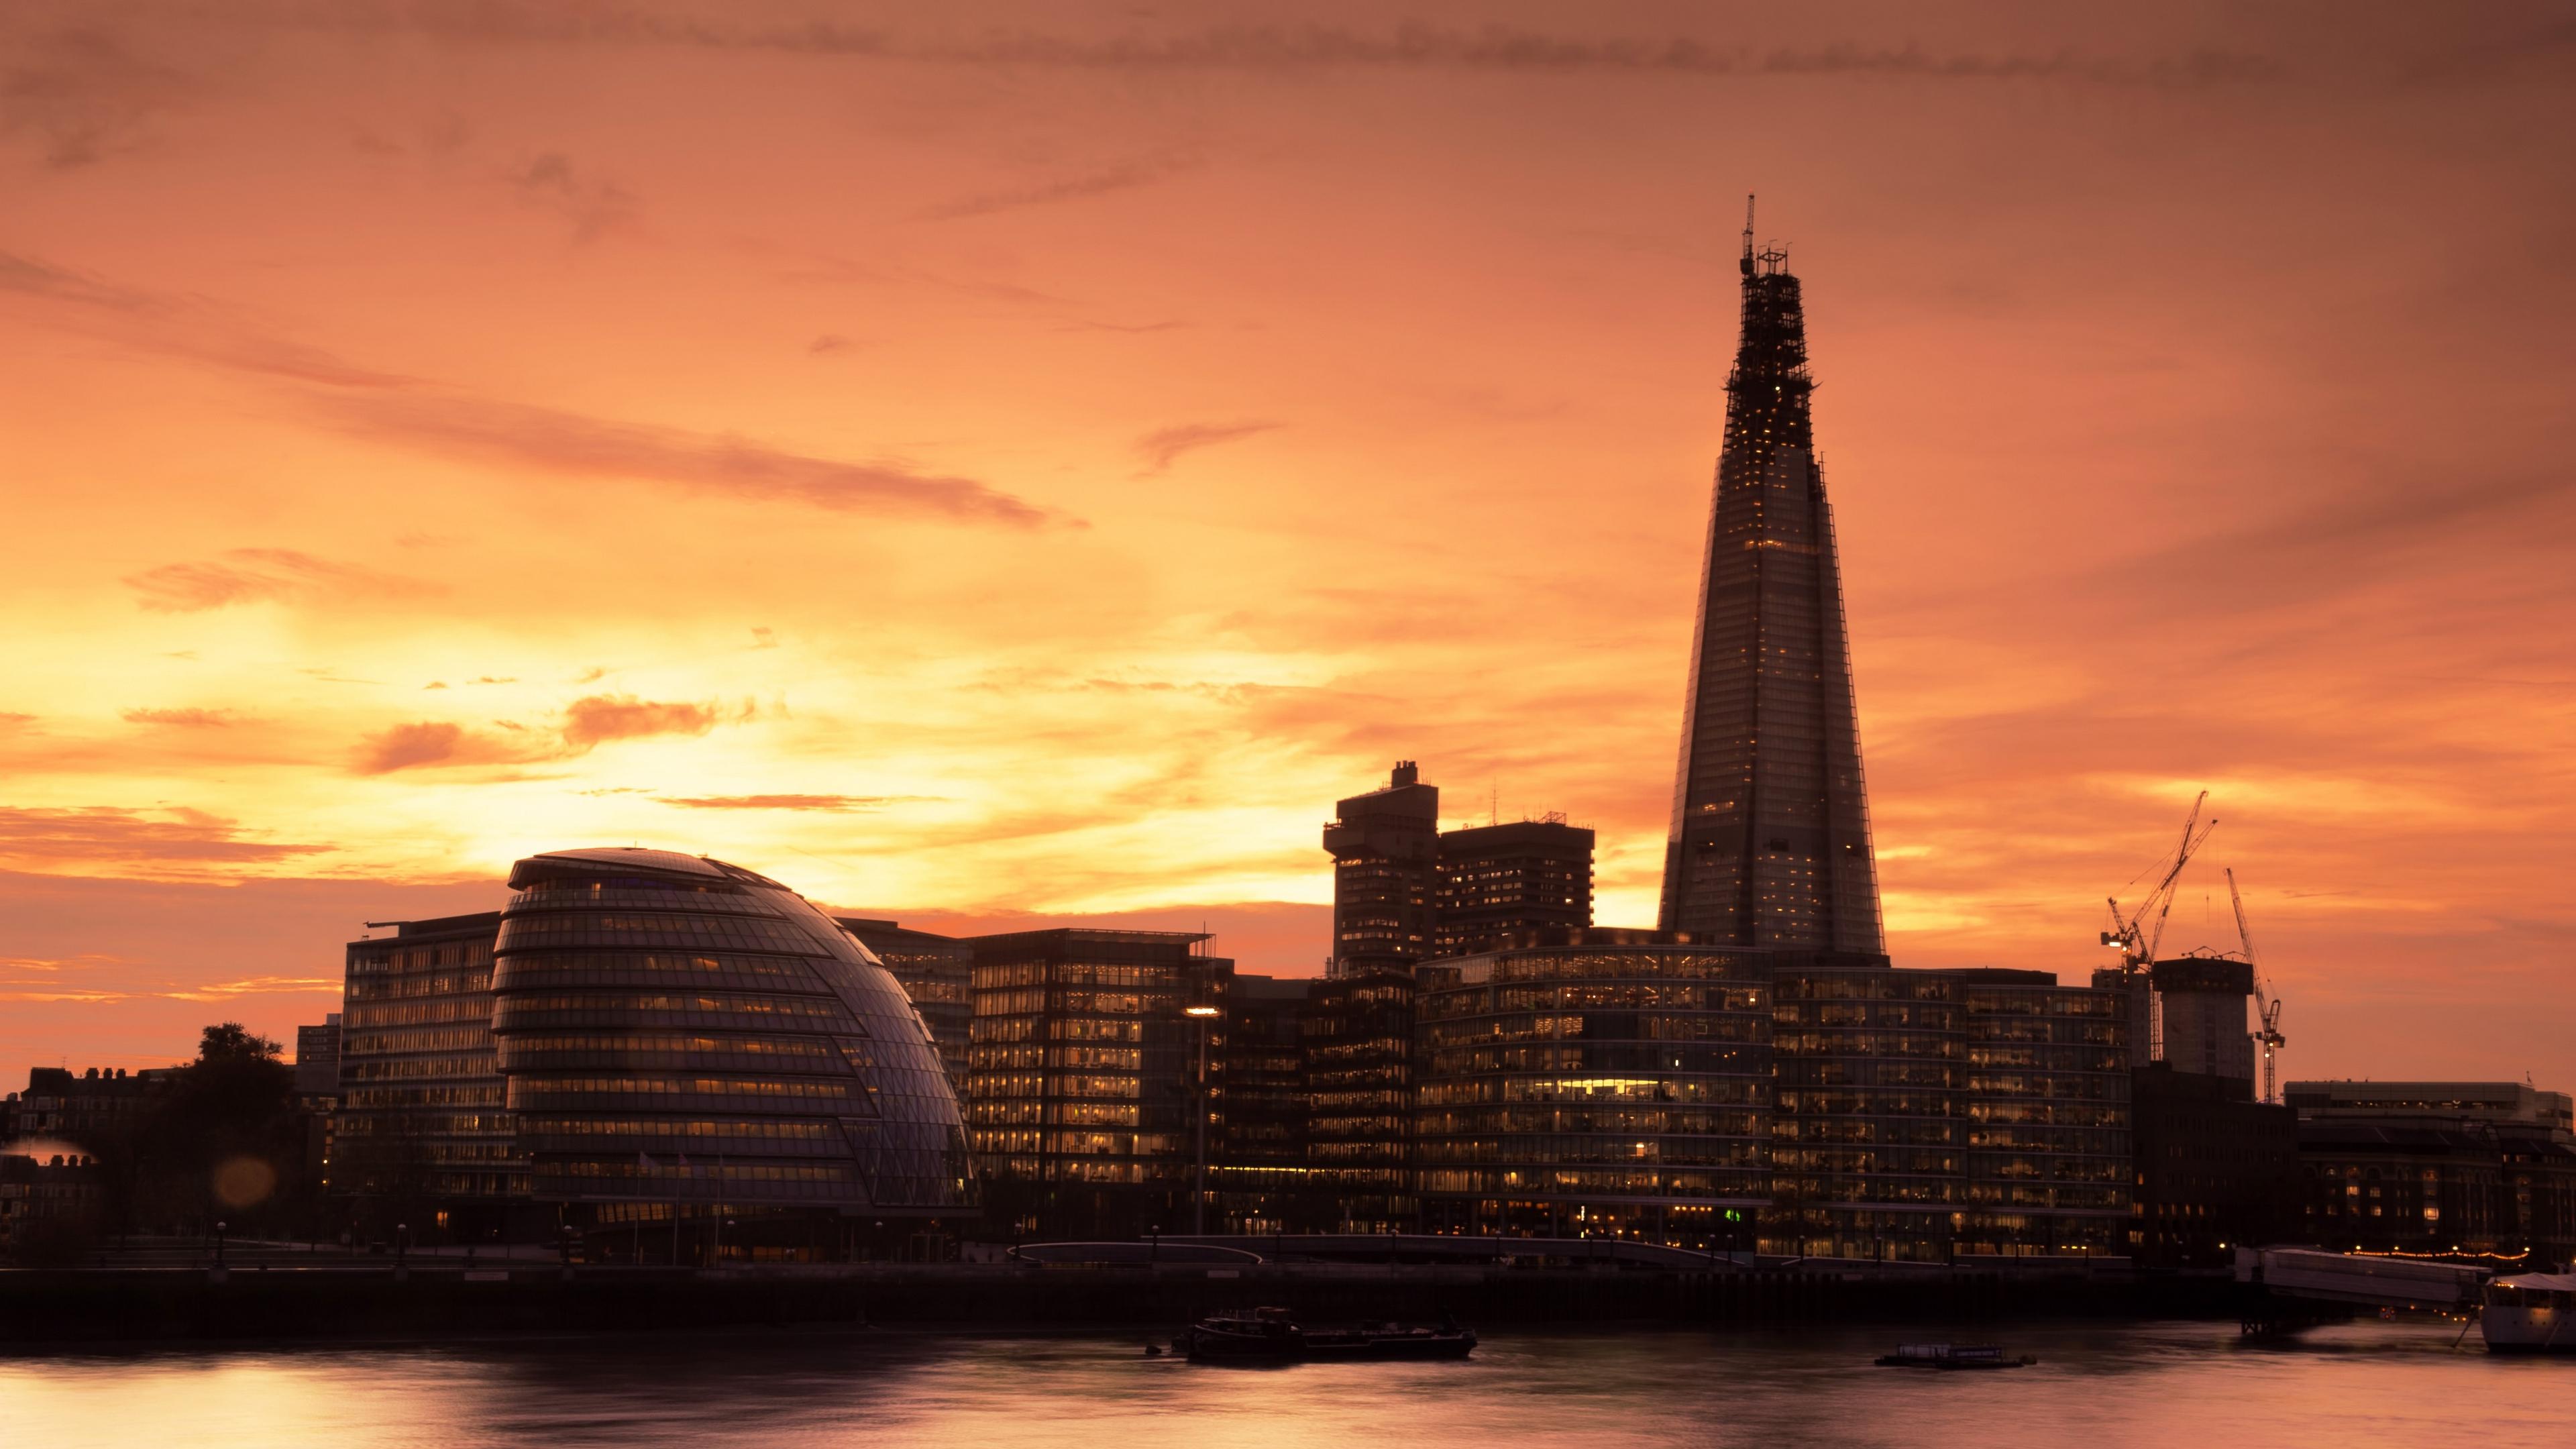 england london thames evening 4k 1538065661 - england, london, thames, evening 4k - Thames, London, England